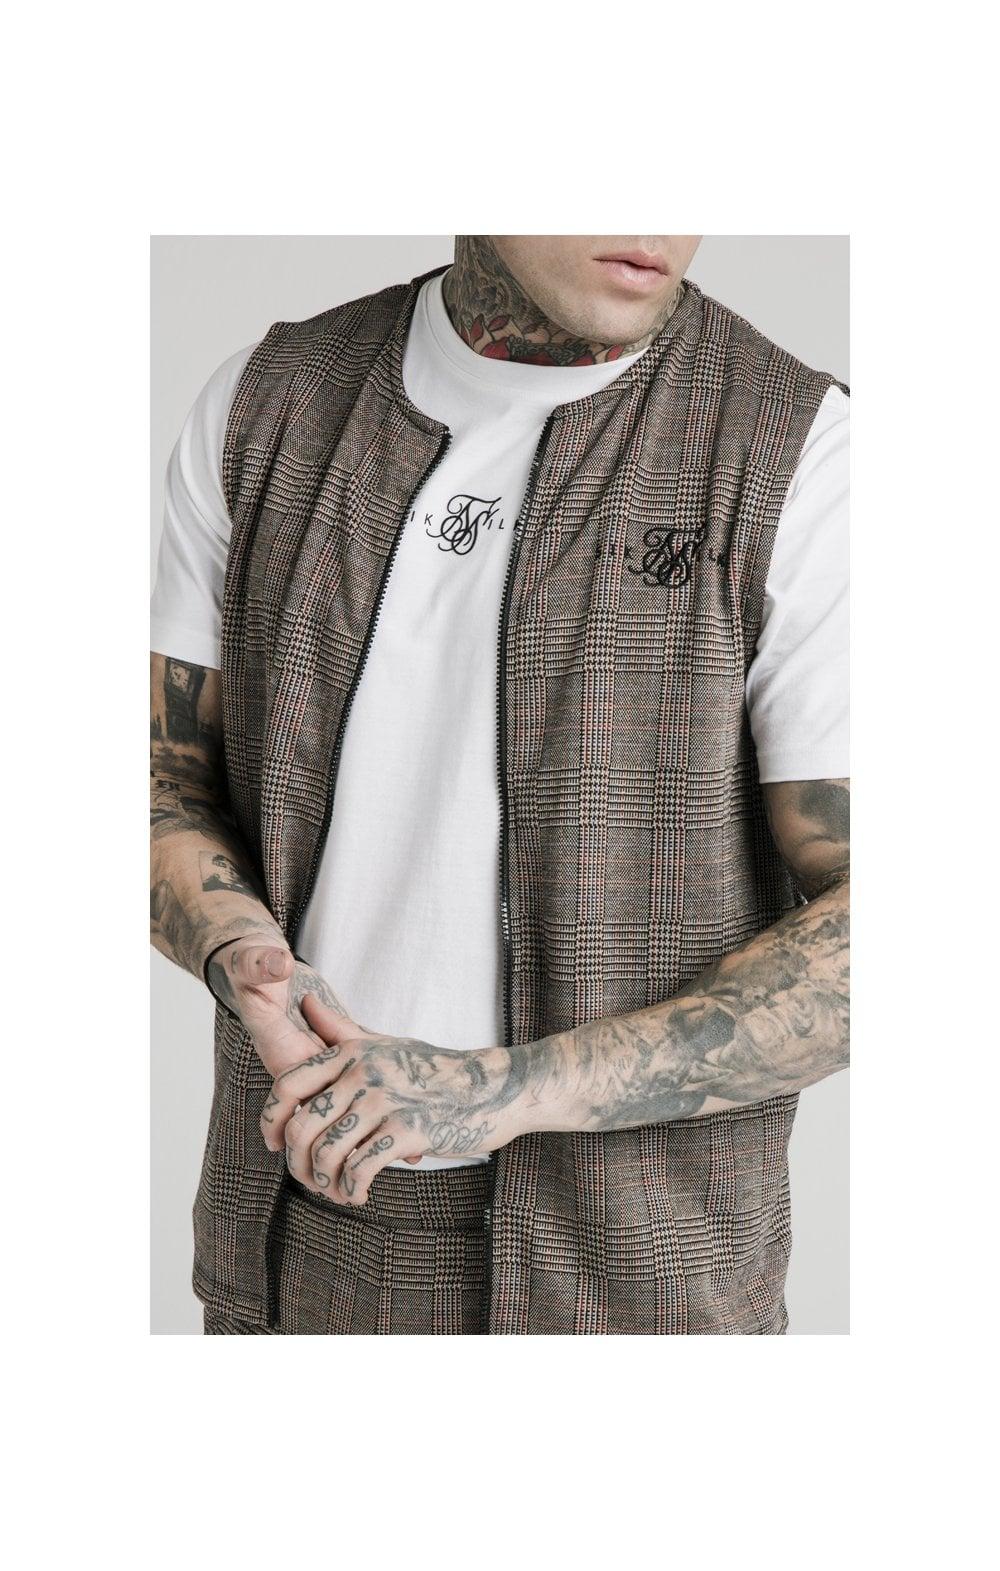 SikSilk Smart Wear Vest - Brown Dogtooth MEN SIZES TOP: Medium